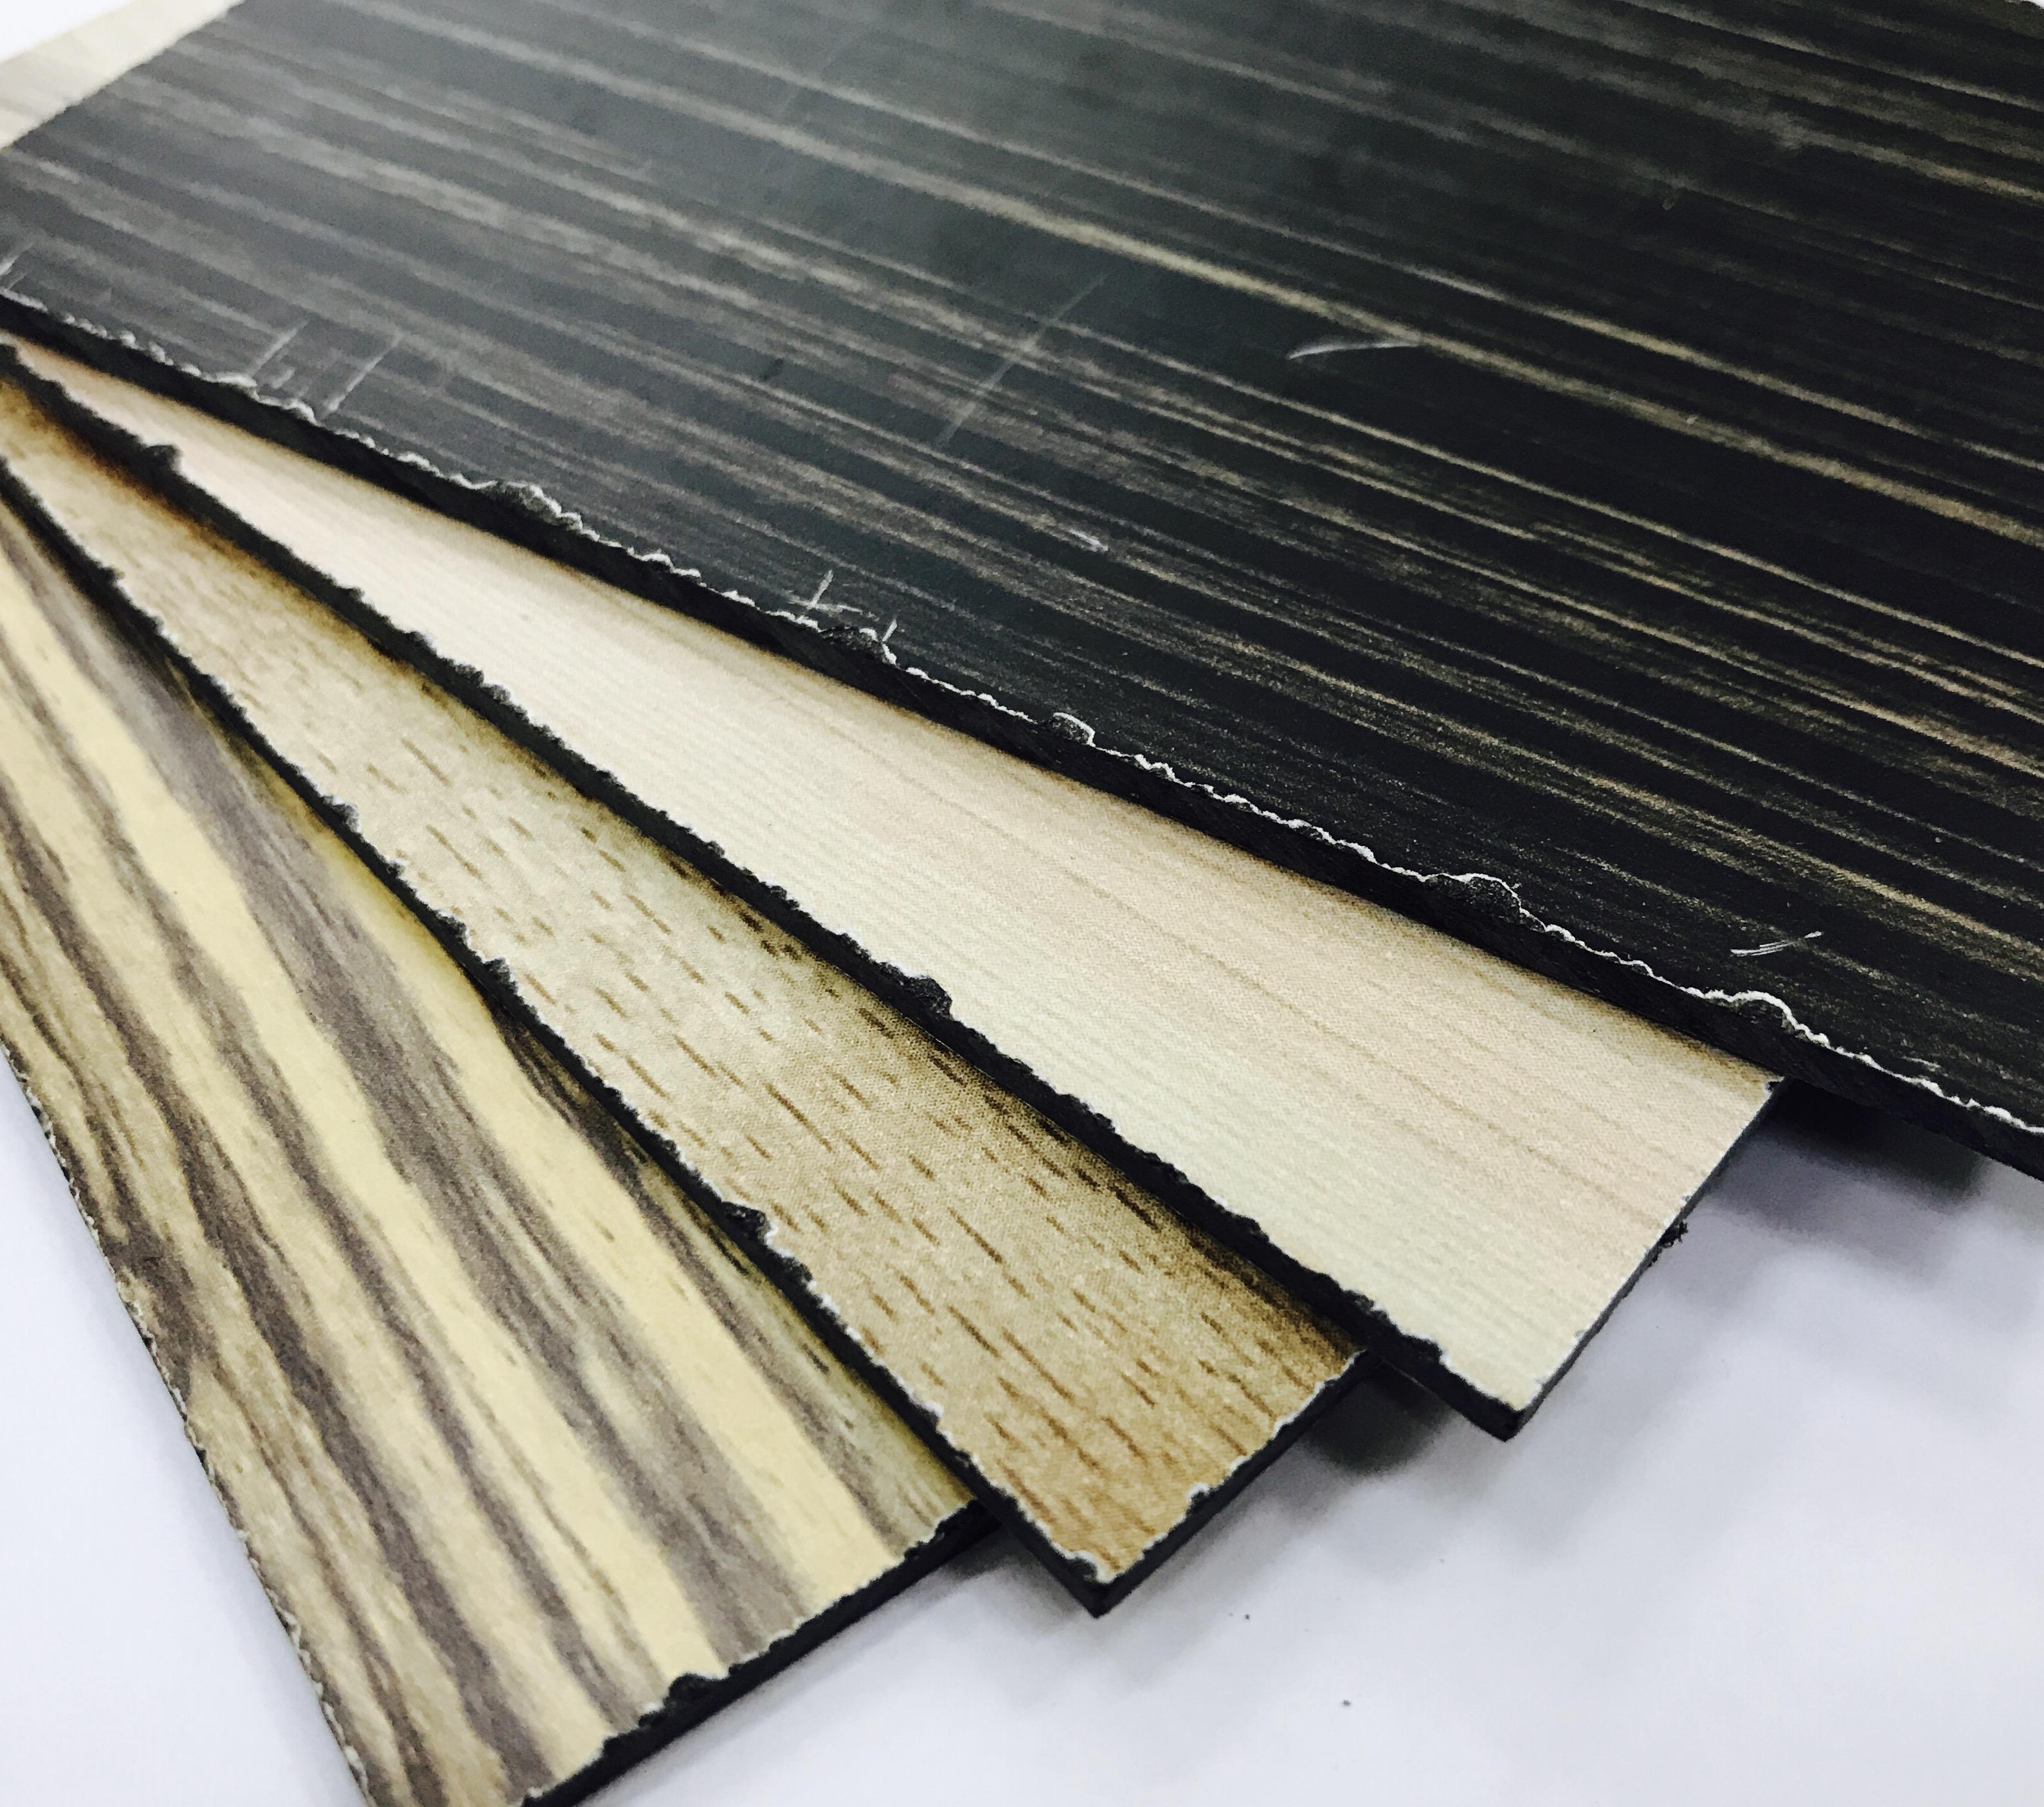 High Pressured Laminate Hpl Panels Asiatic Panels